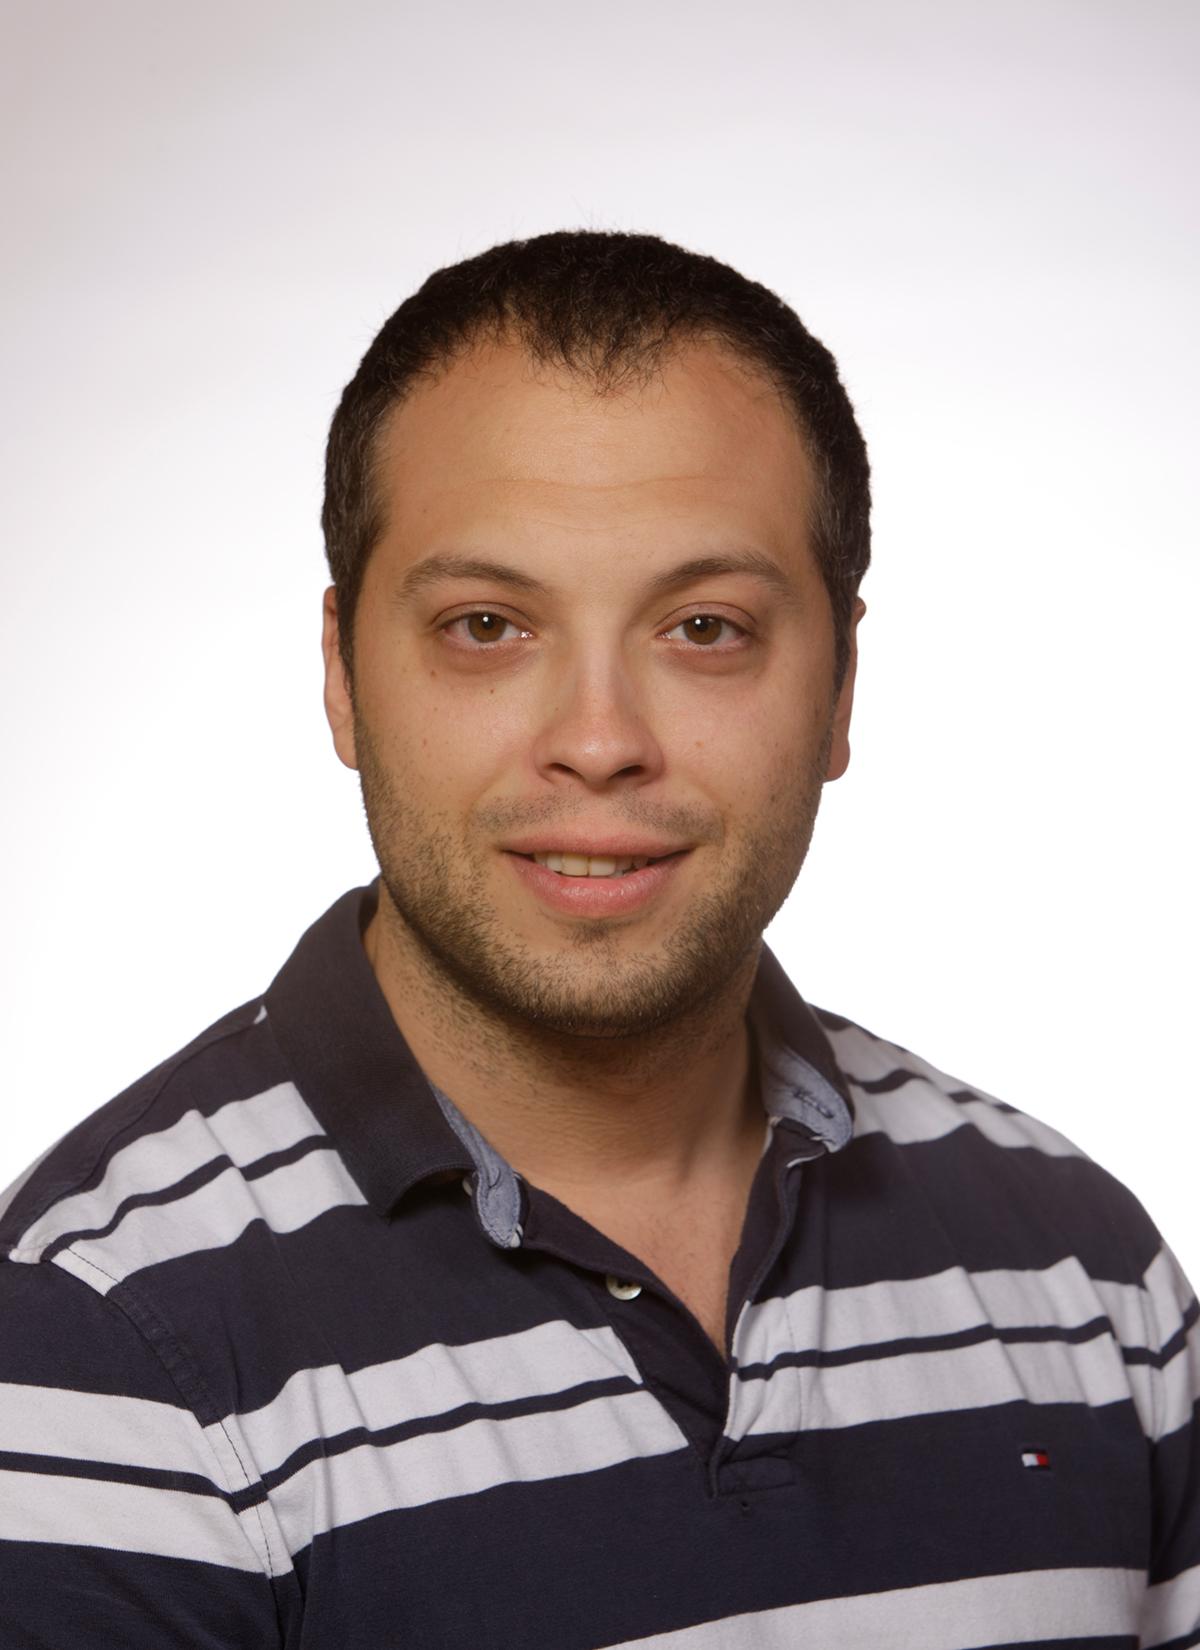 Mr. Dominic Gauthier